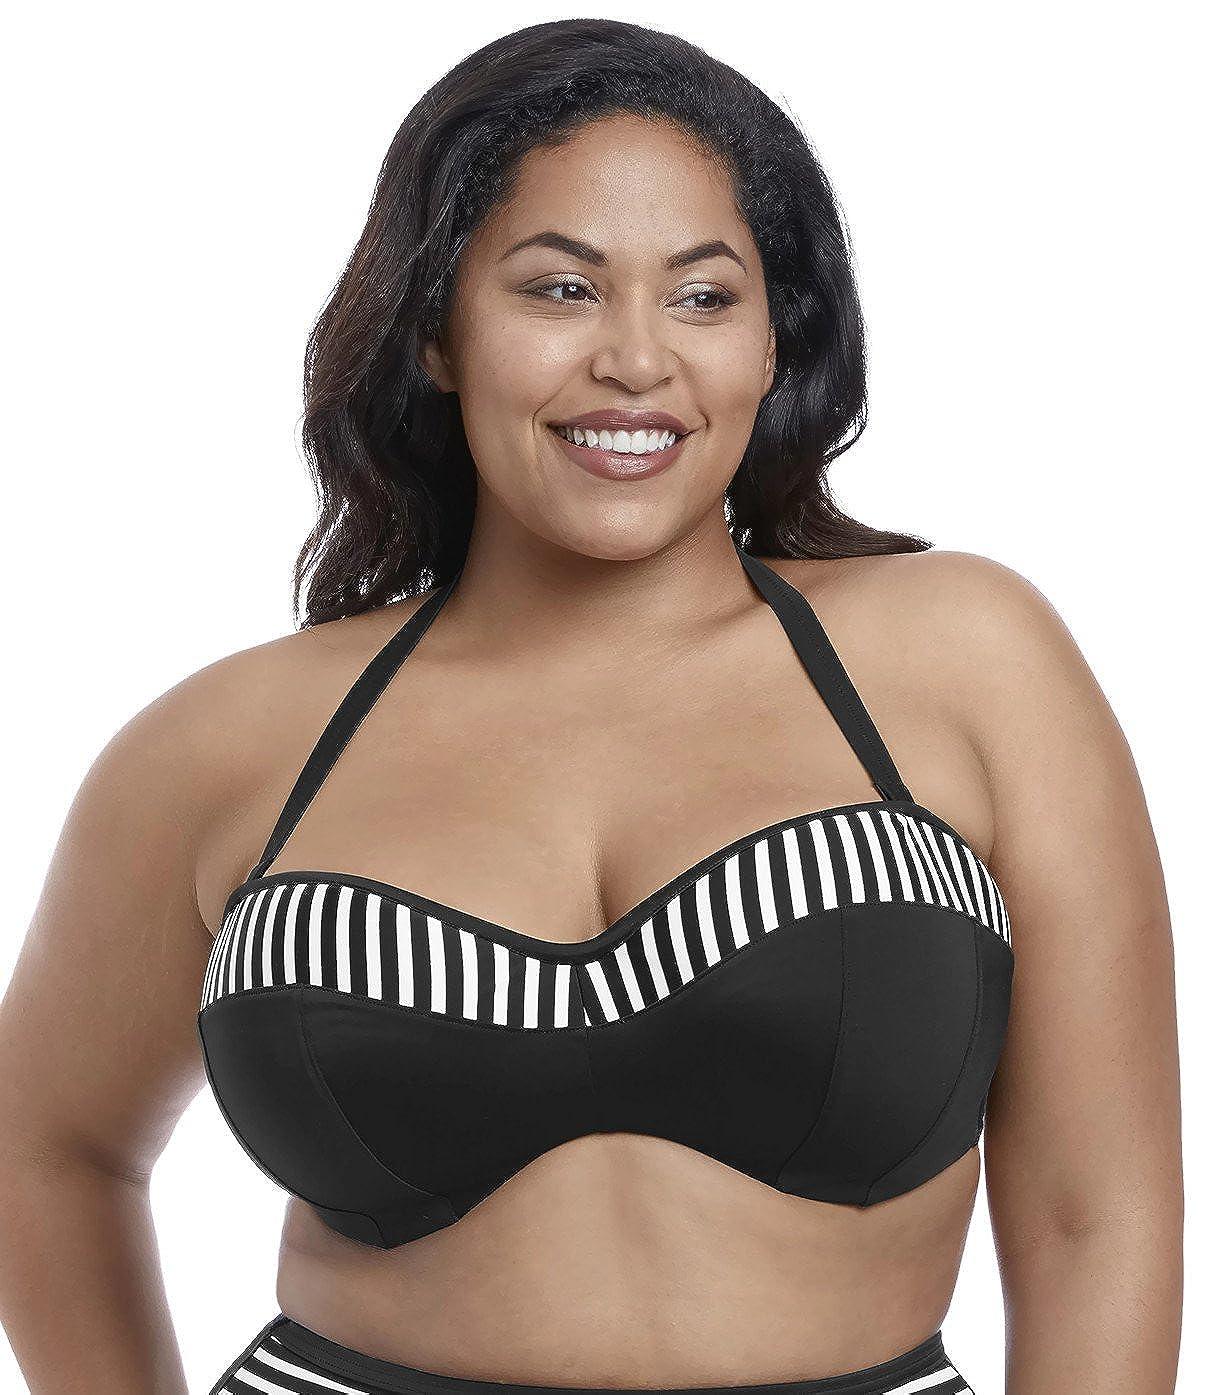 42GG, Black Elomi Swim Malibu Days Underwired Bandeau Bikini Top